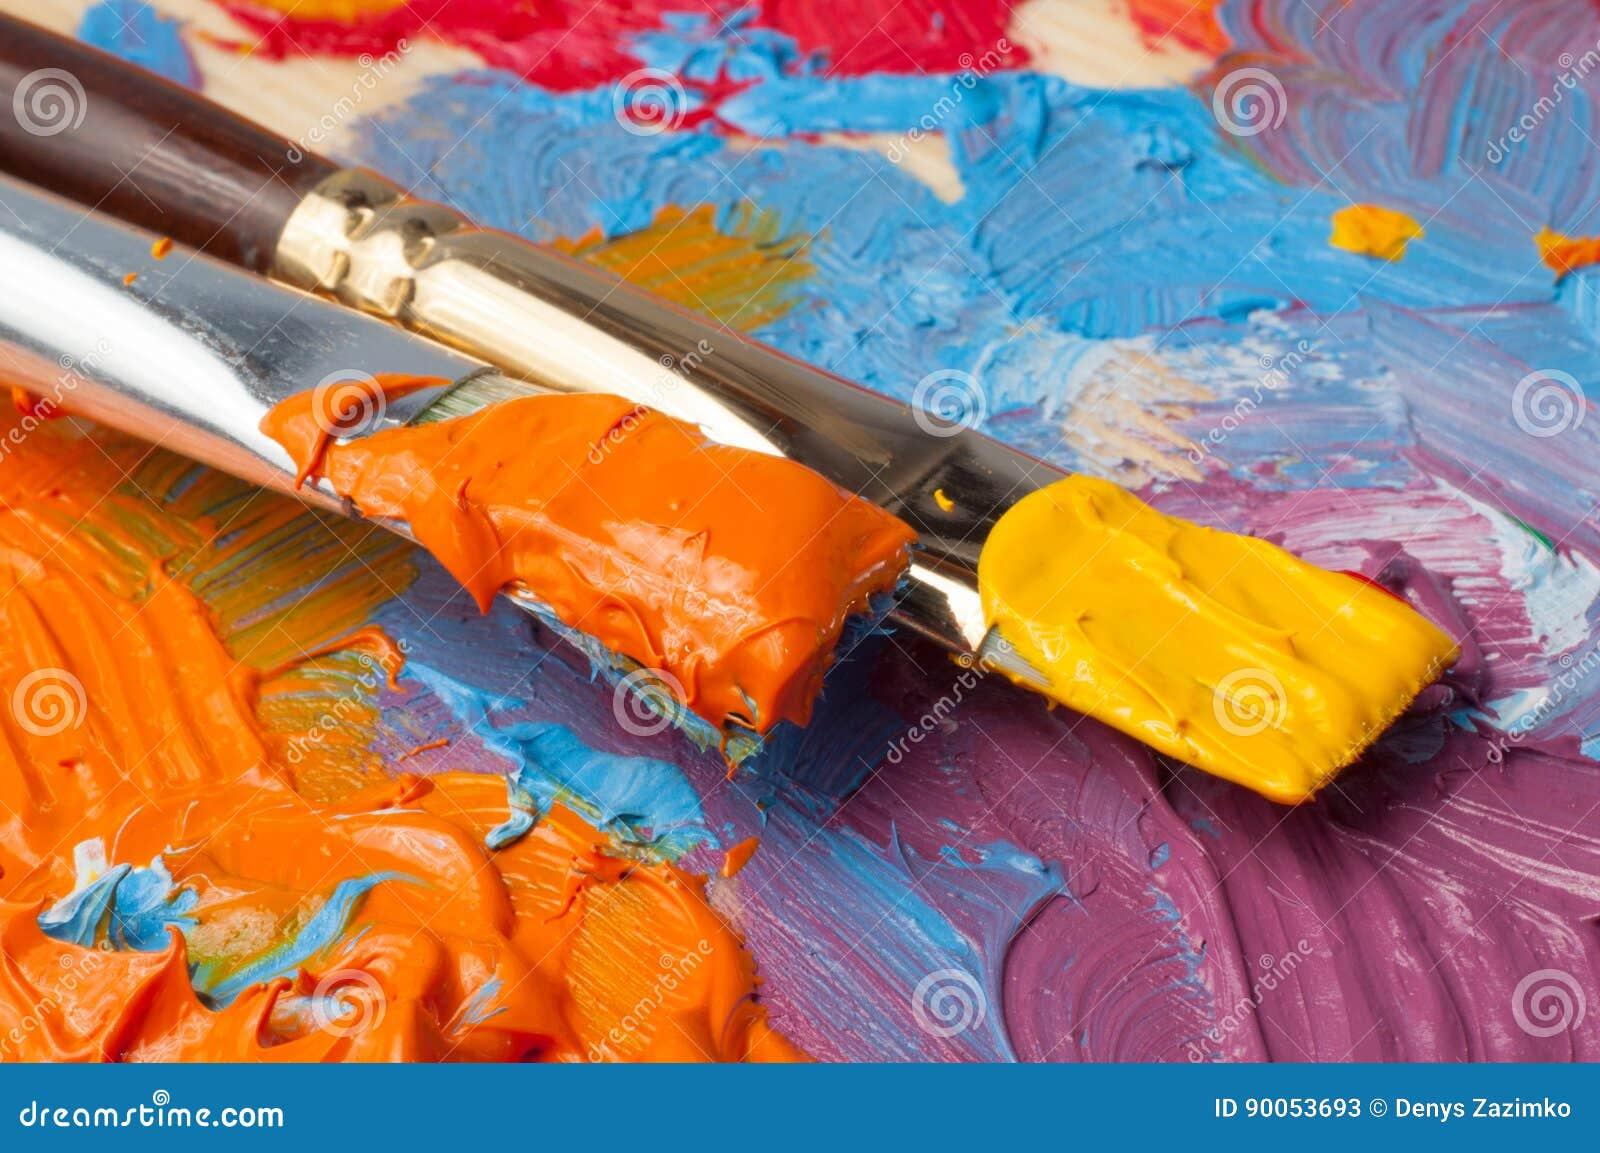 Color palette with multi-colored paints